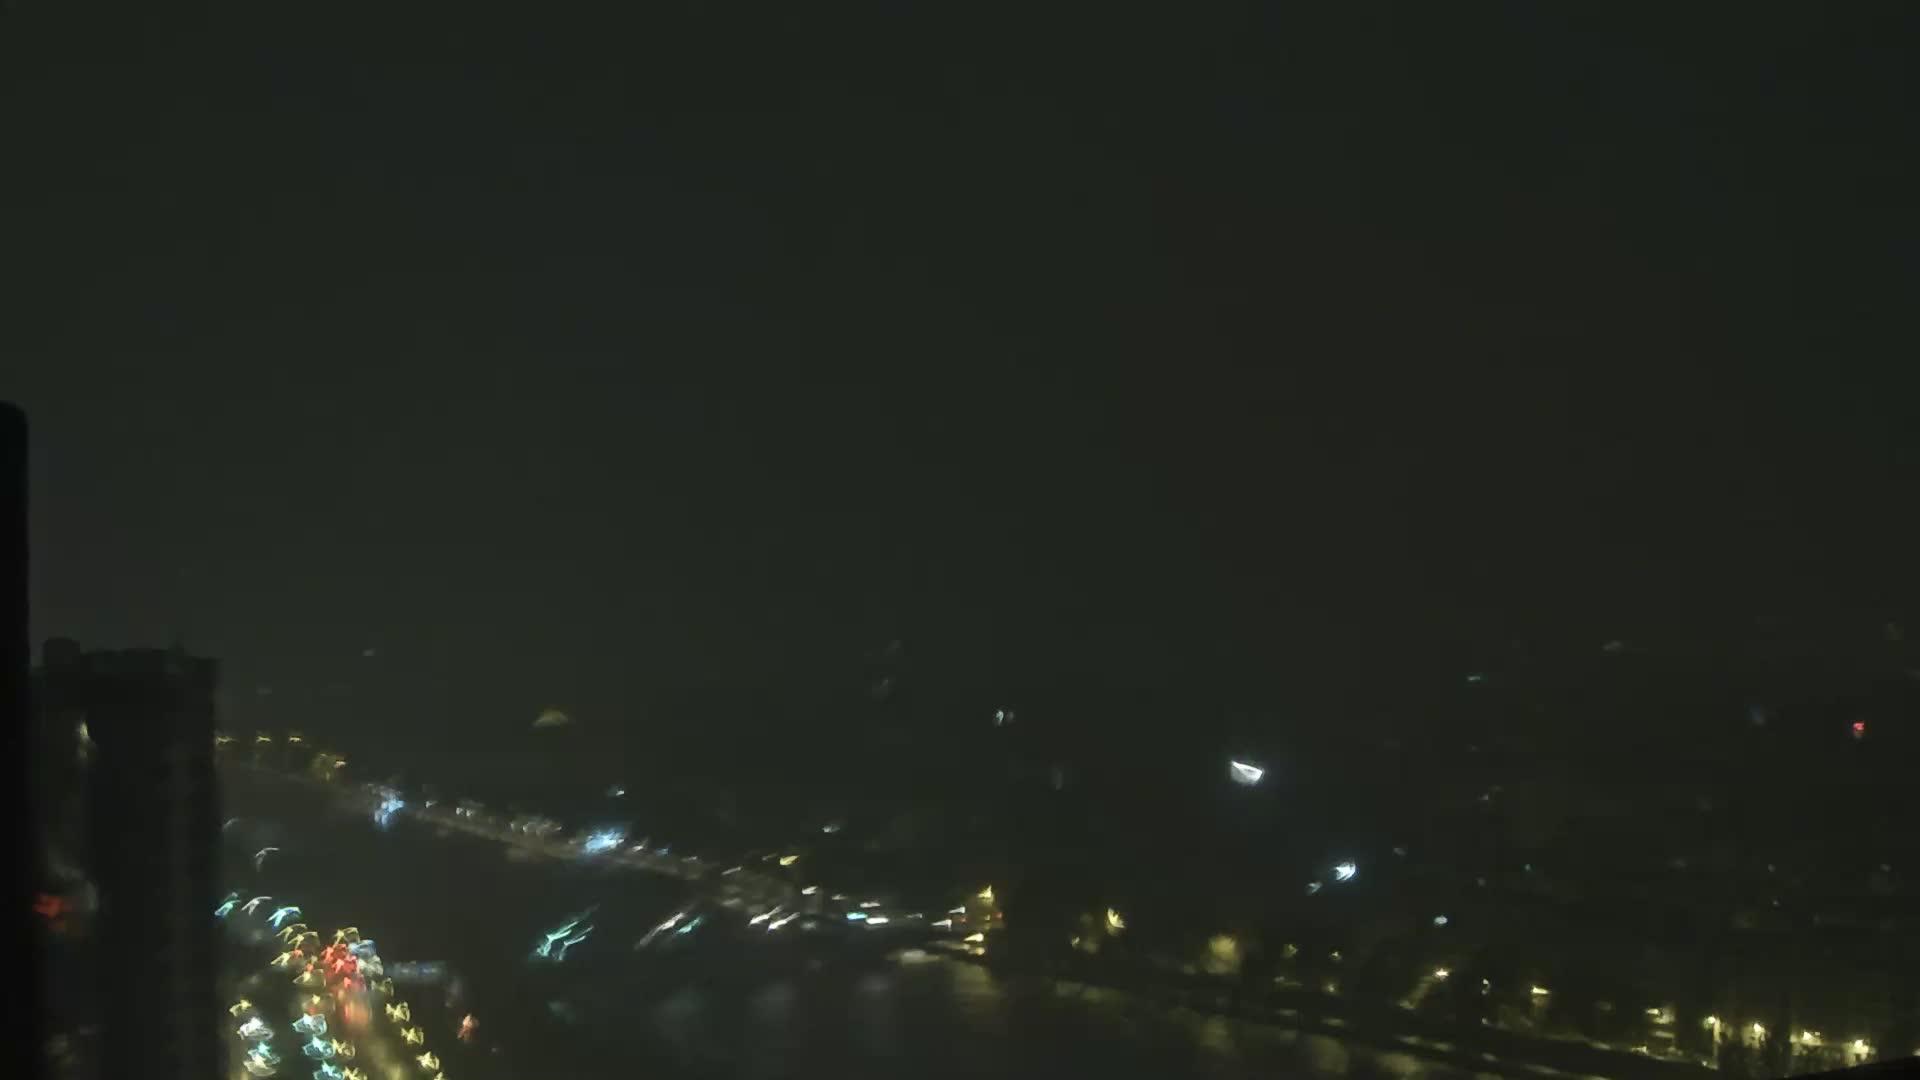 Paris Sat. 03:23